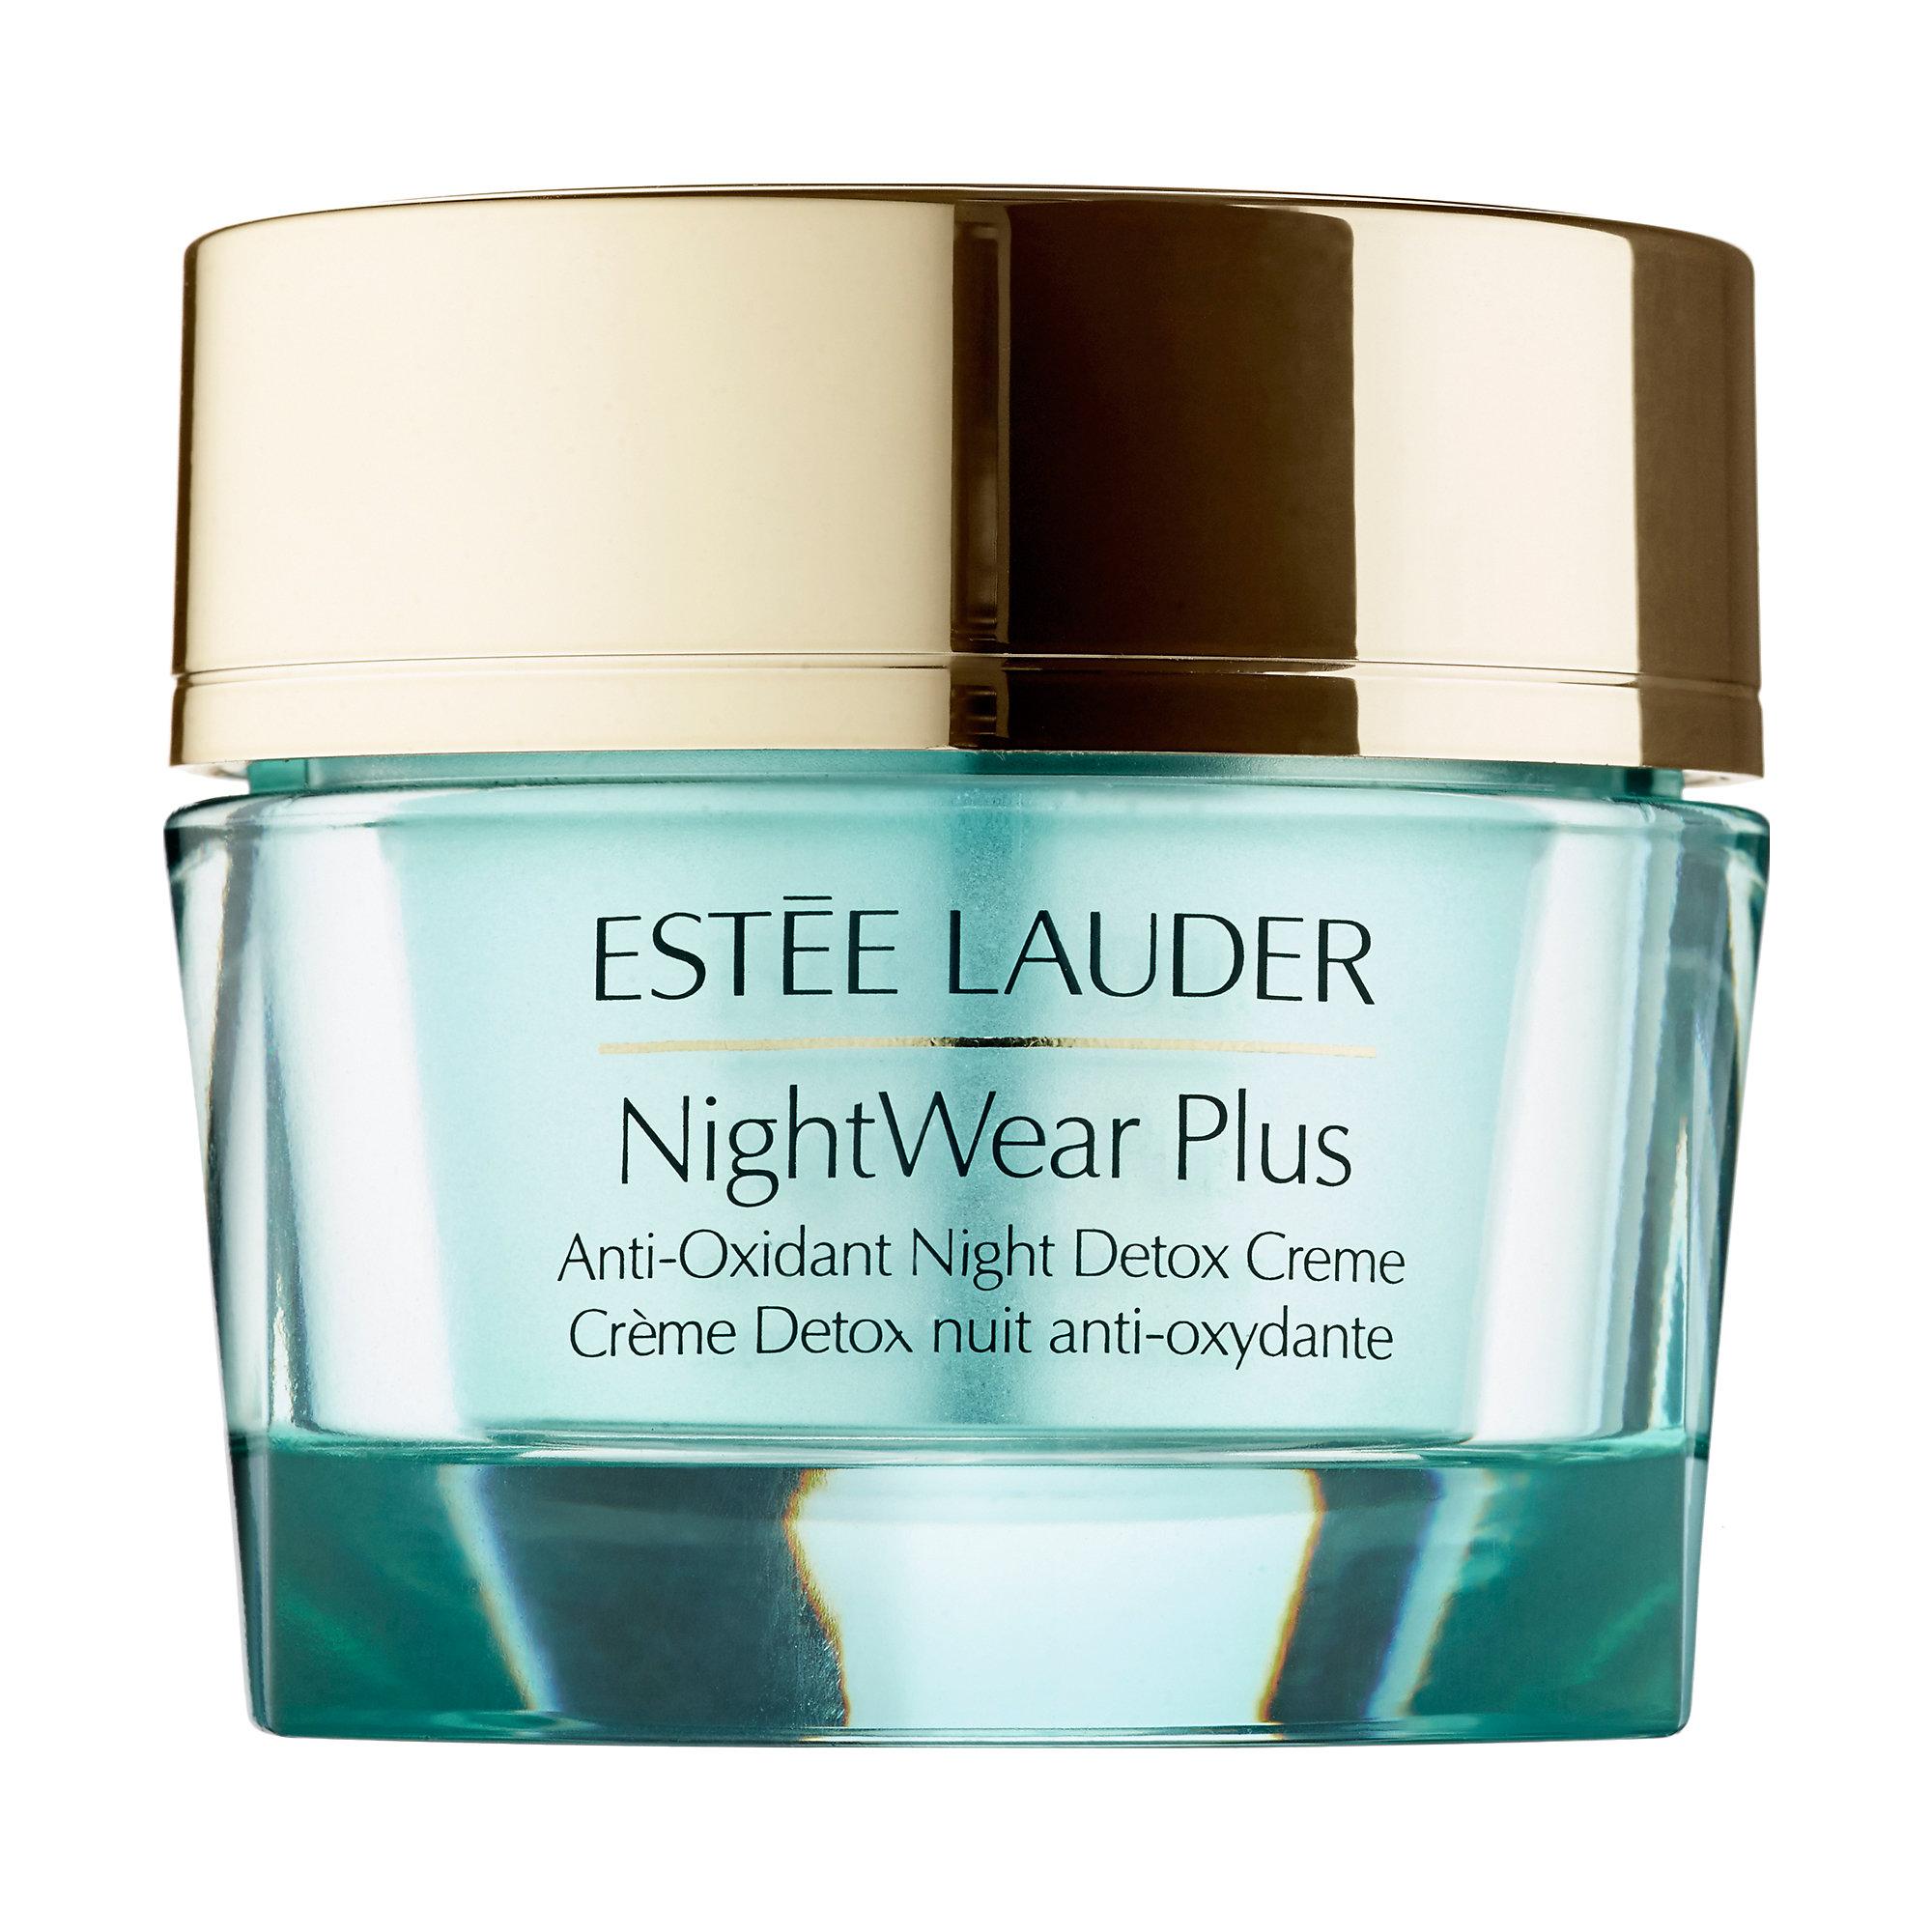 Estée Lauder - Nigthwear Plus Anti-oxidant Night Detox Creme 50 ml